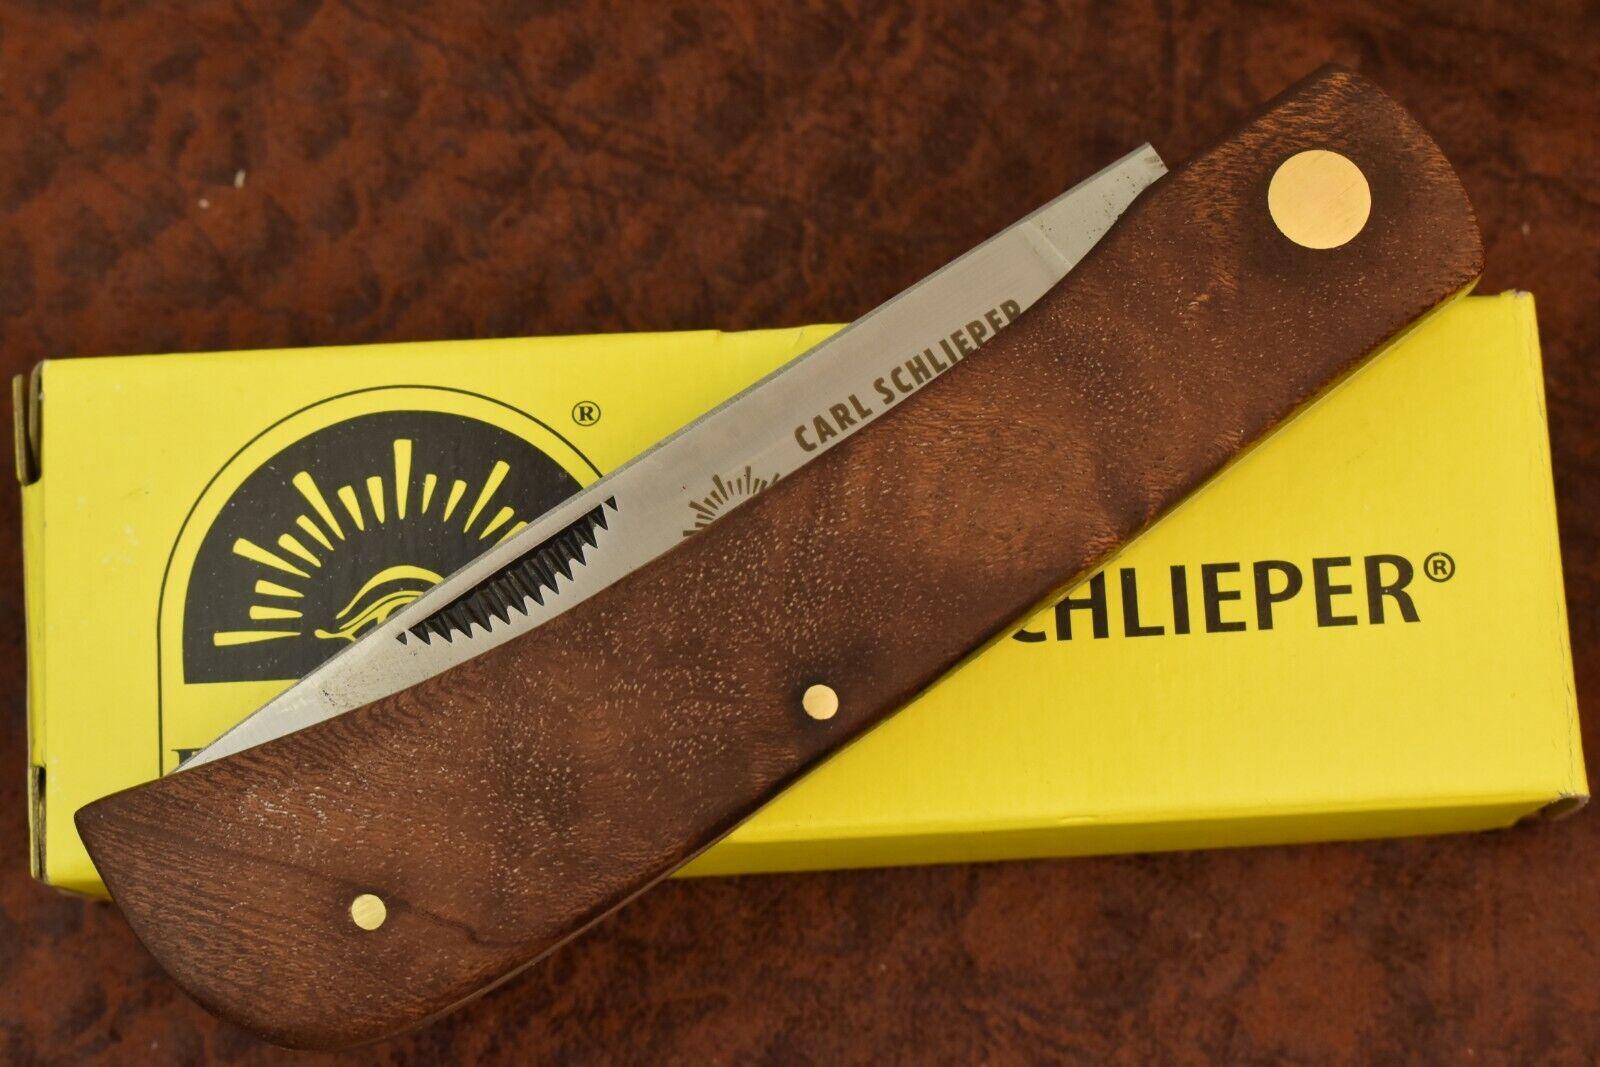 GERMAN EYE BRAND CARL SCHLIEPER JUMBO WOOD SODBUSTER KNIFE SOLINGEN GERMANY 9560